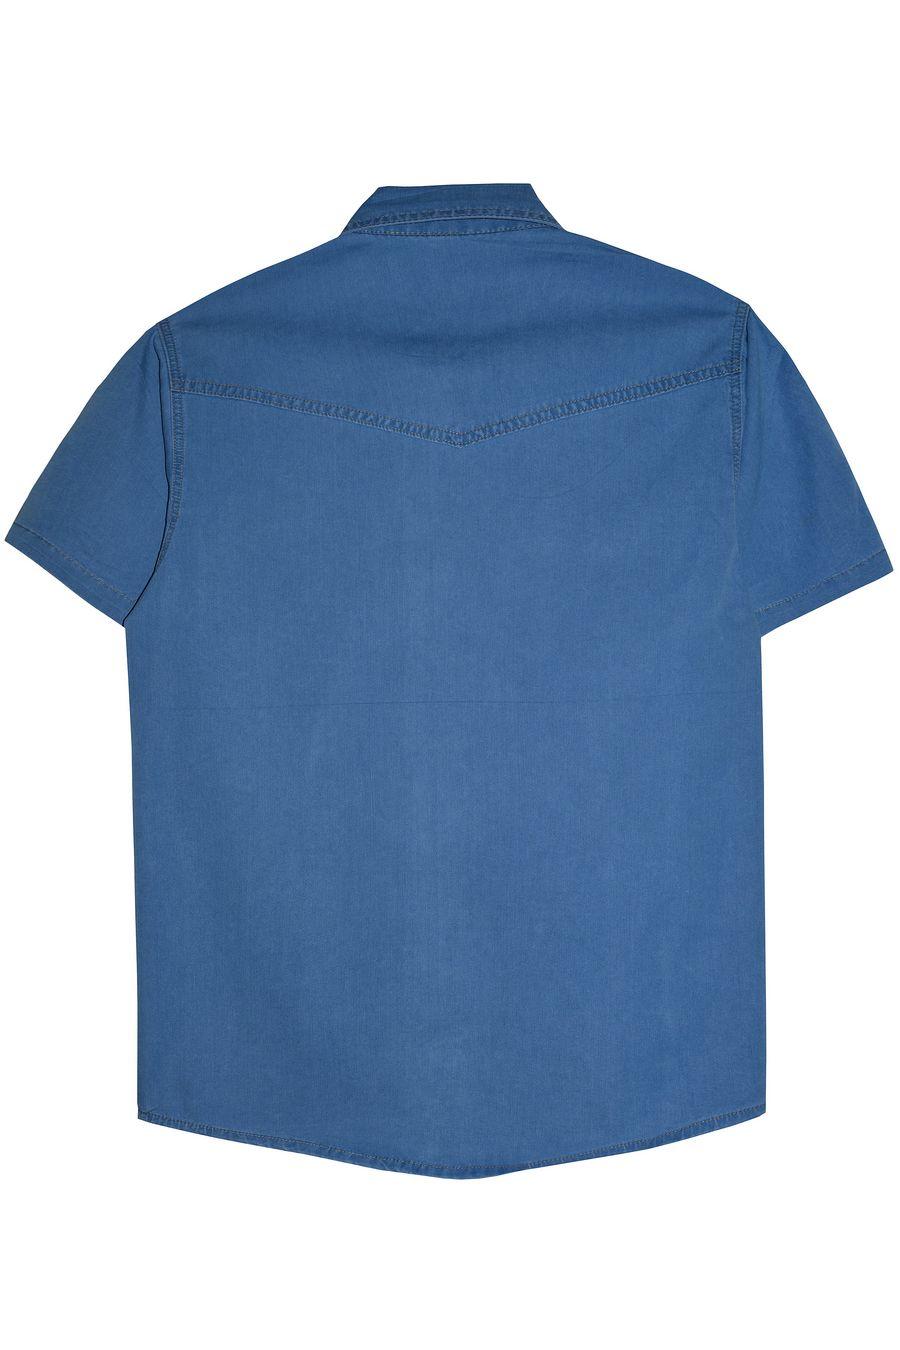 Рубашка мужская Vicucs 728E/CT-321-20 (S-2XL) - фото 2